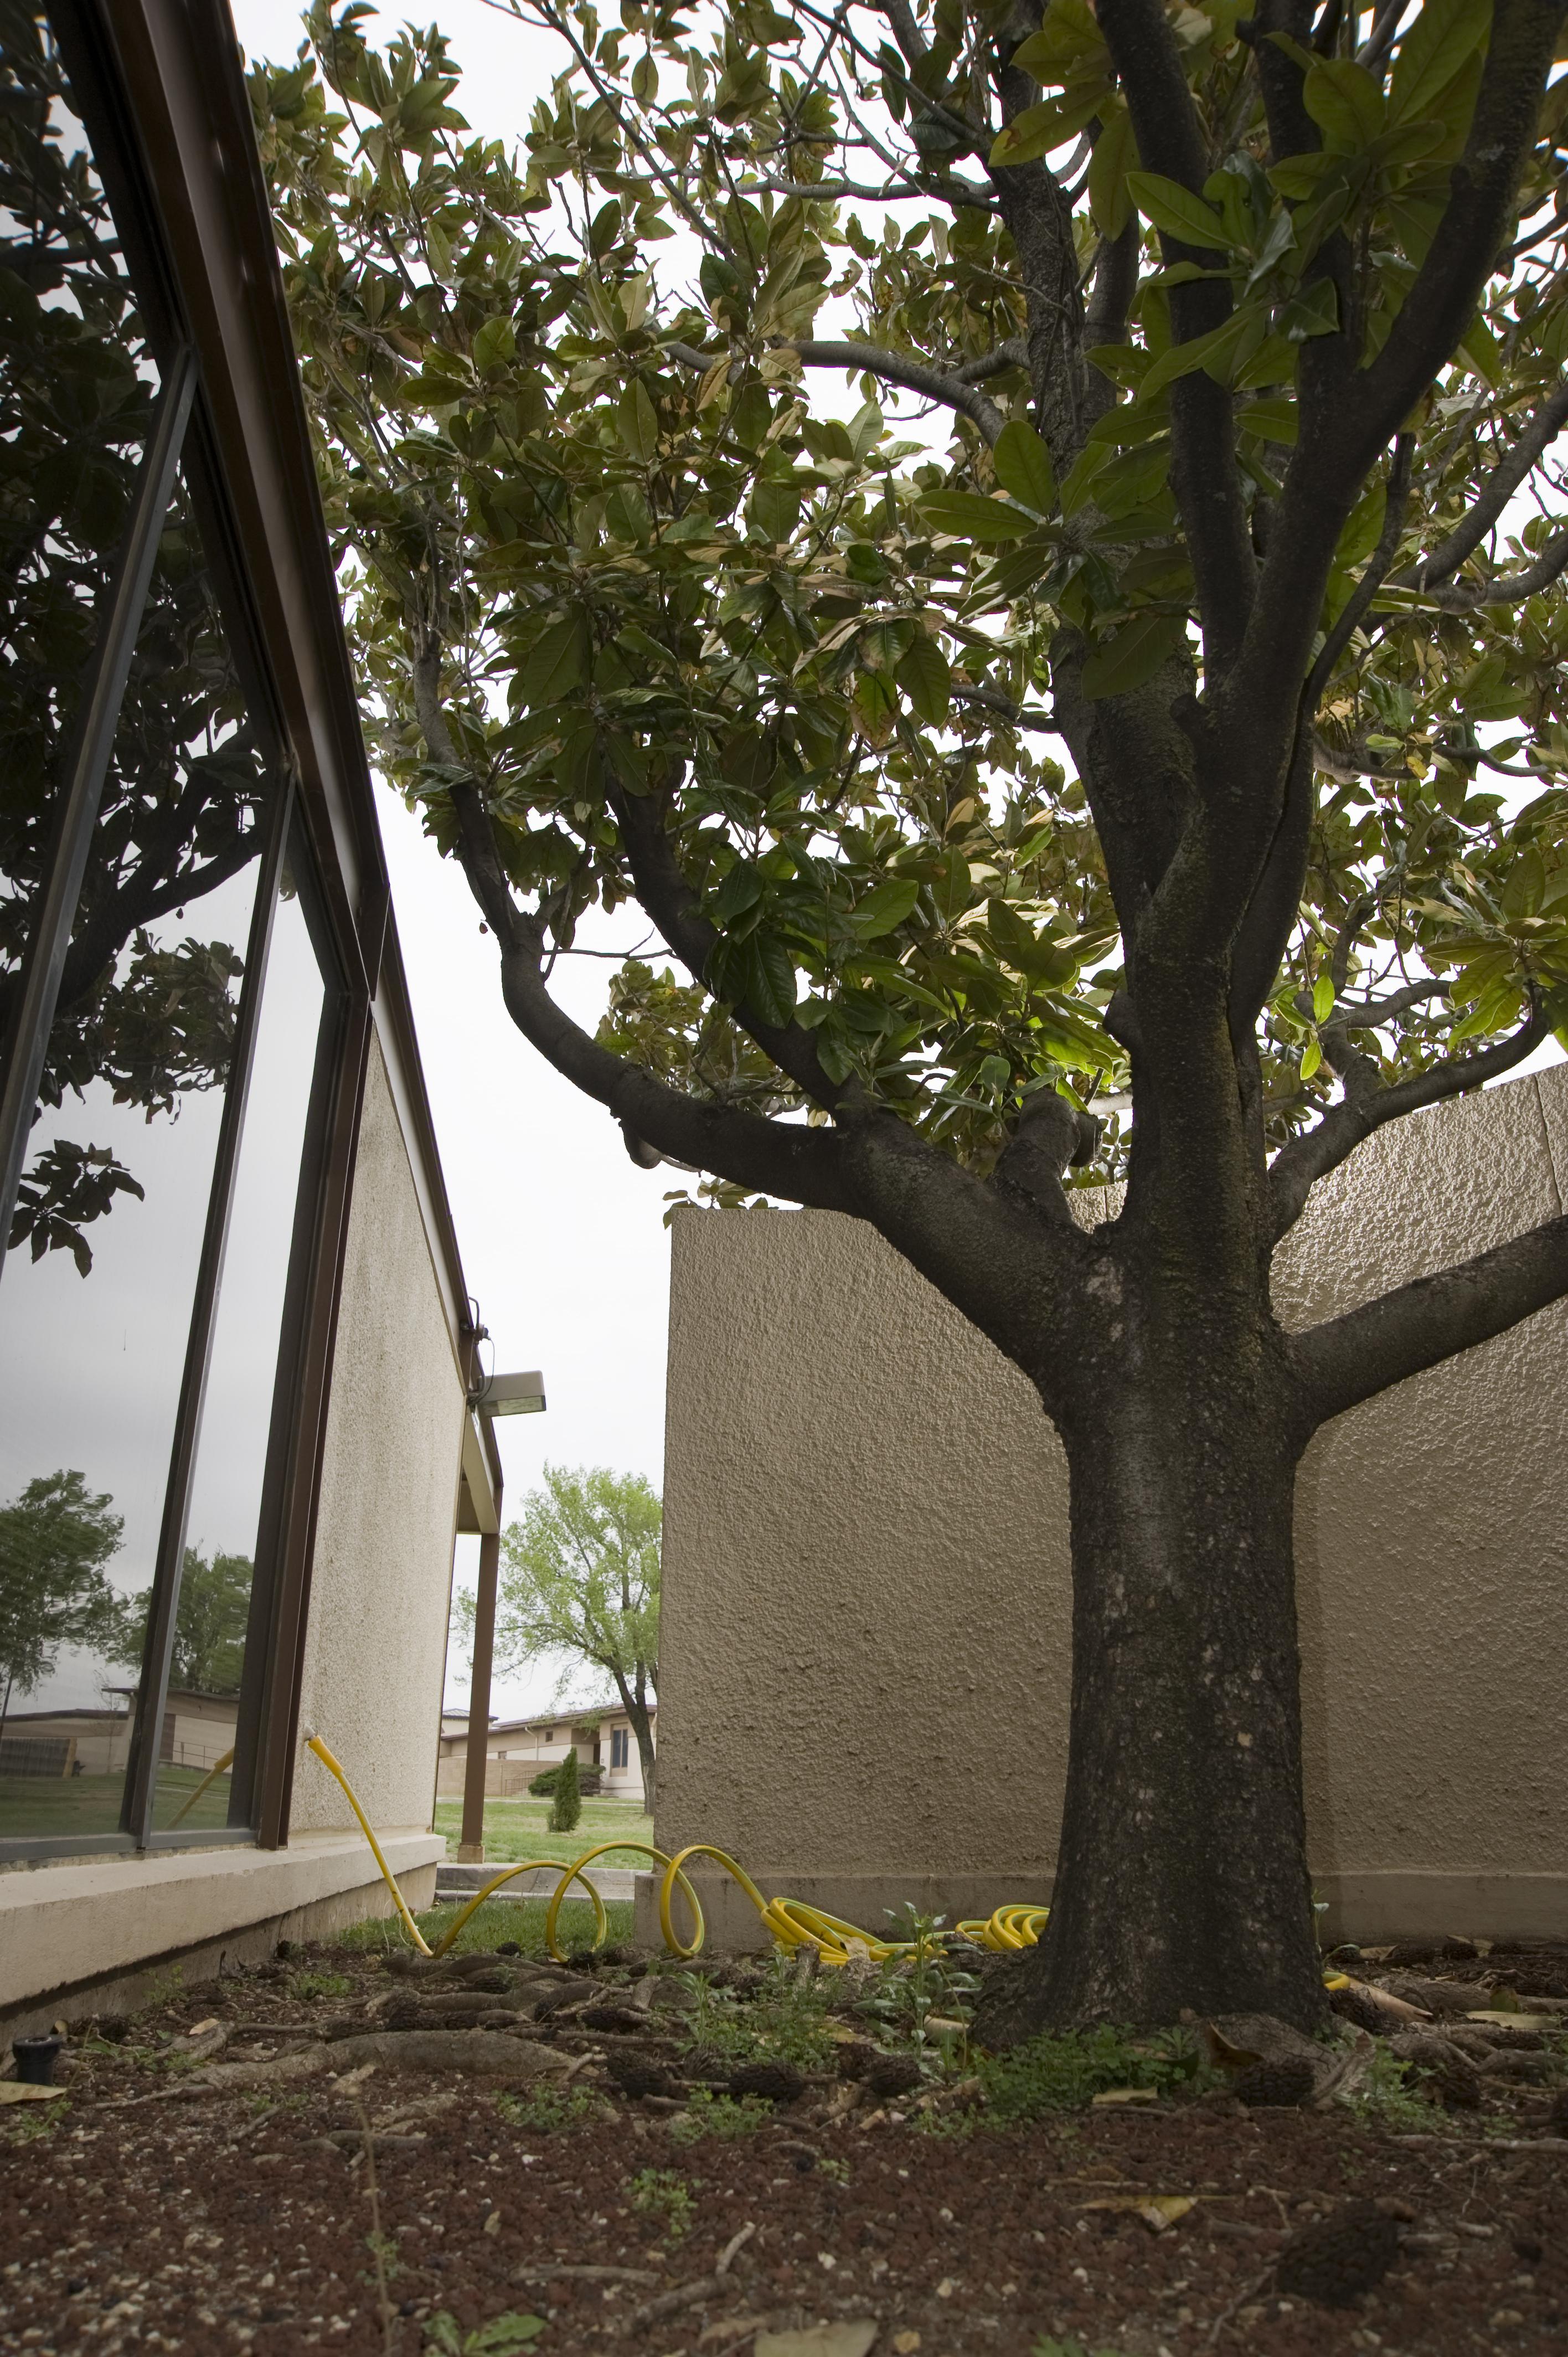 Airmen To Recognize Trees